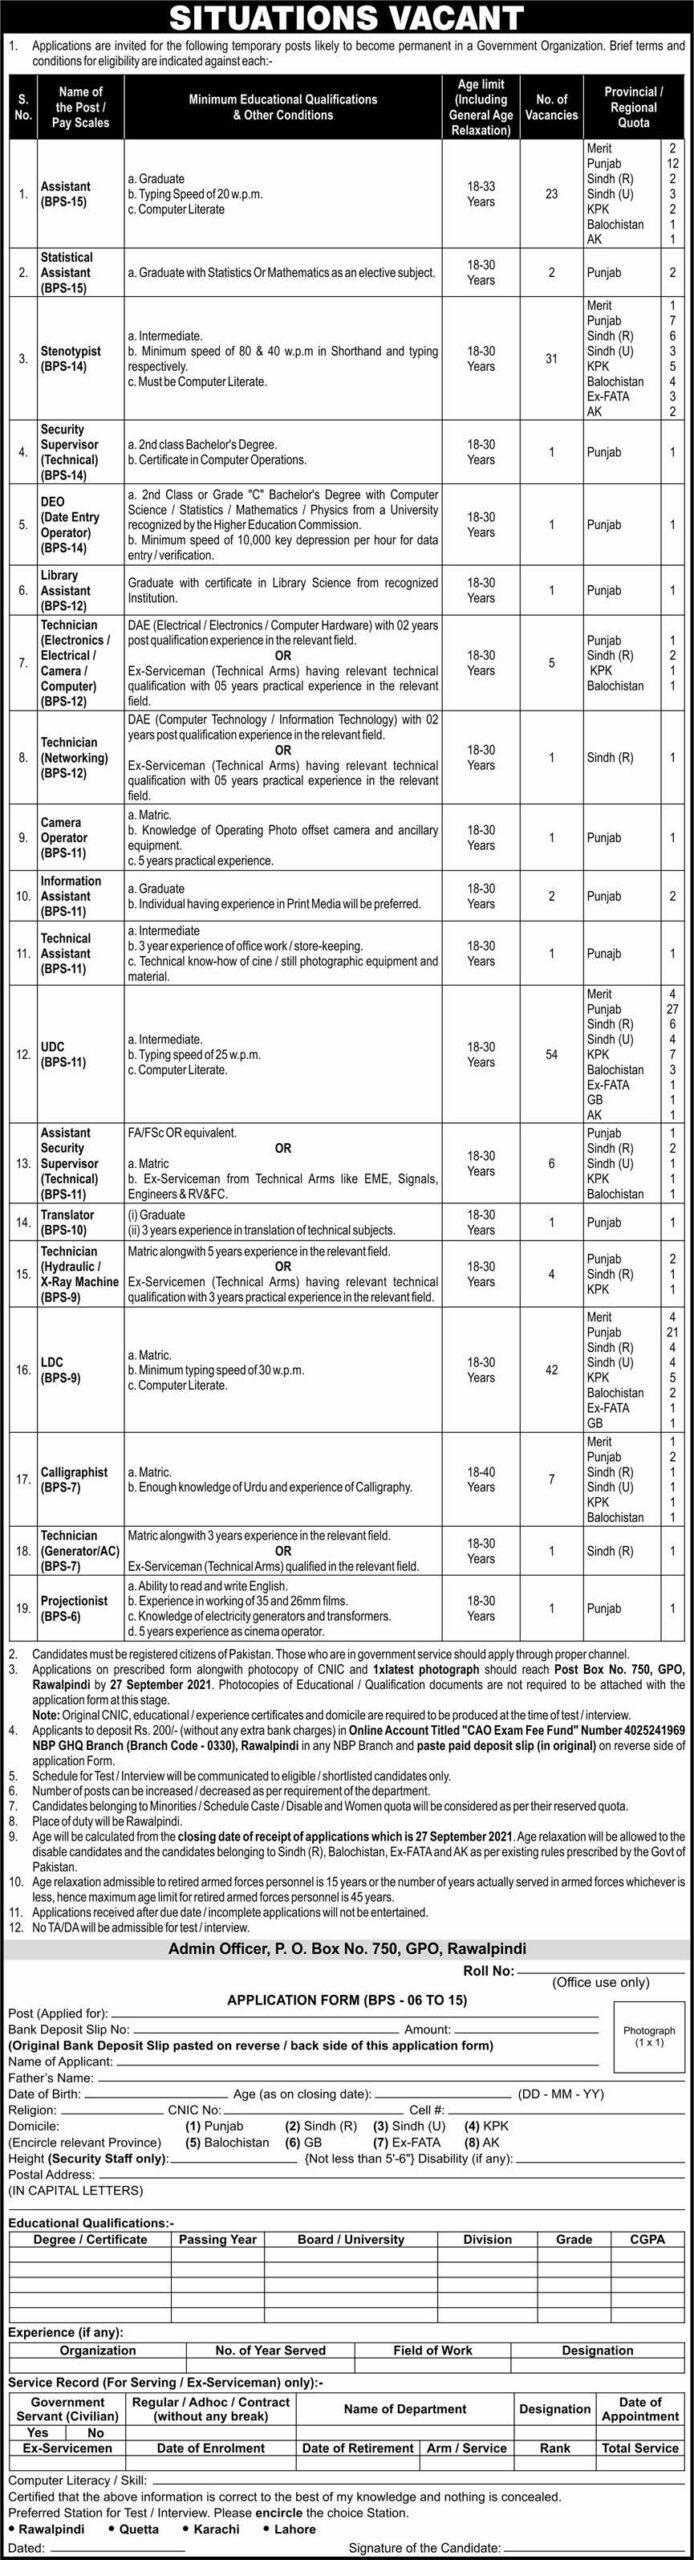 Pak Army Po Box GPO 750 Rawalpindi Jobs 2021